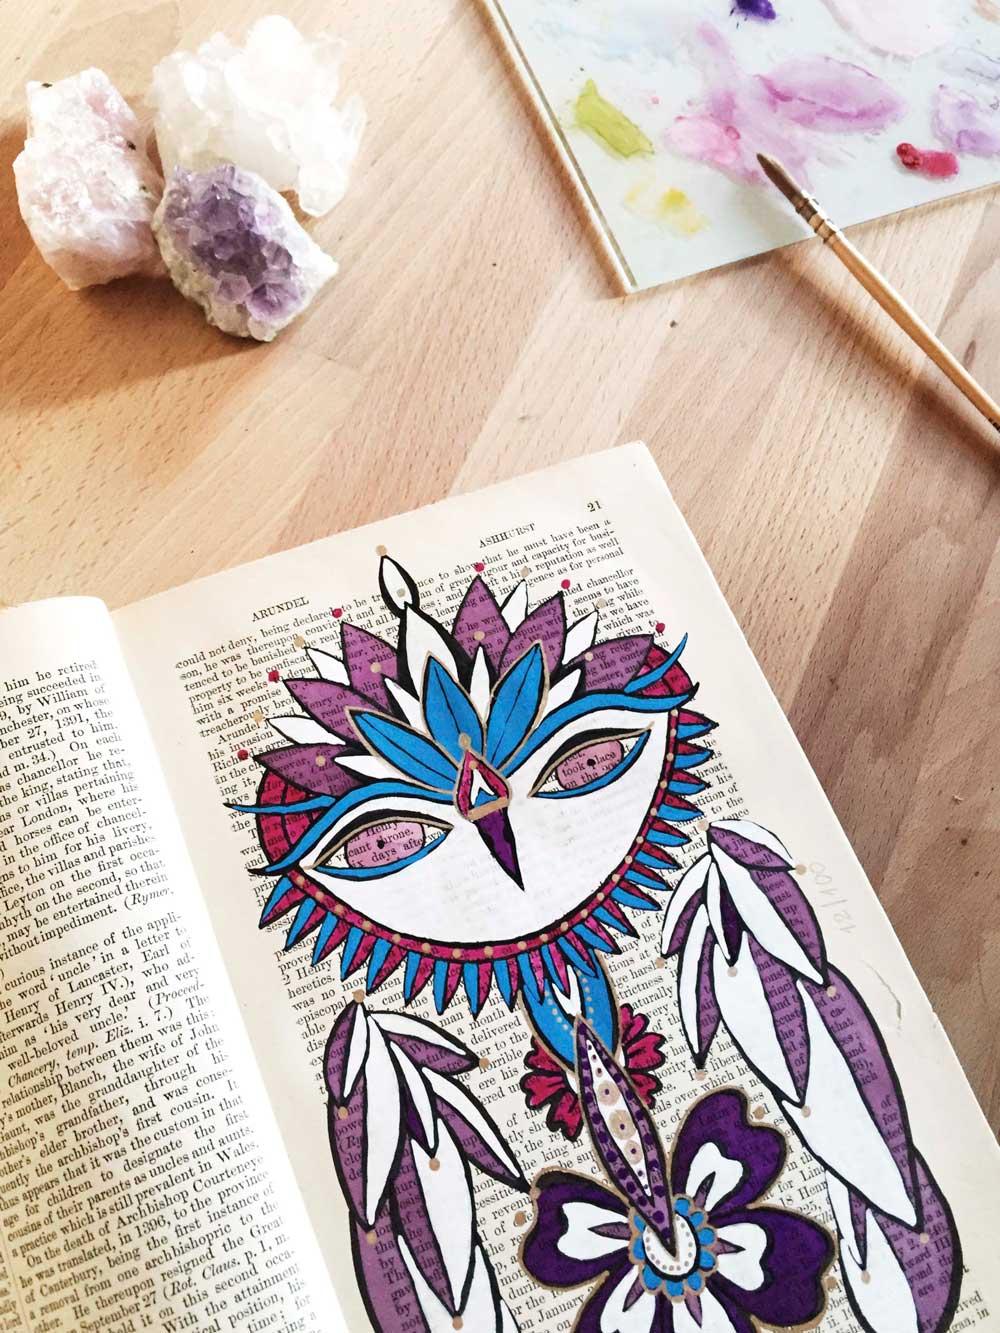 violet-cloud-book-page-painting-eve-devore-12.jpg